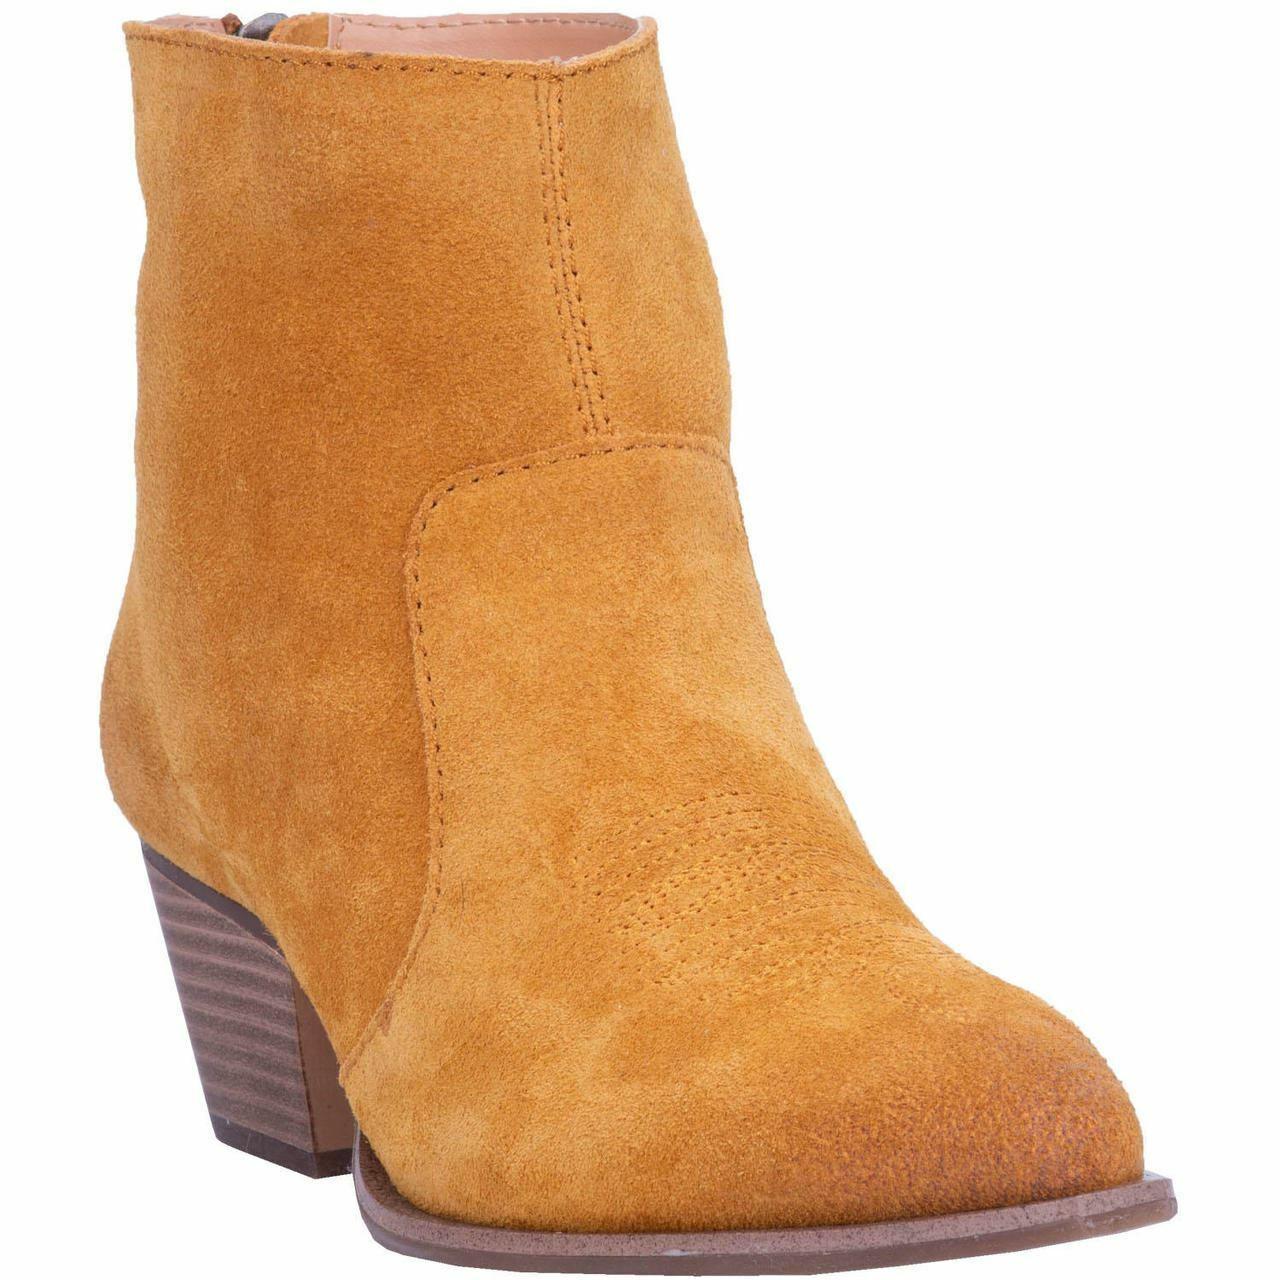 Dingo Women's Klanton Western Cowboy Ankle Boots Mustard DI 112